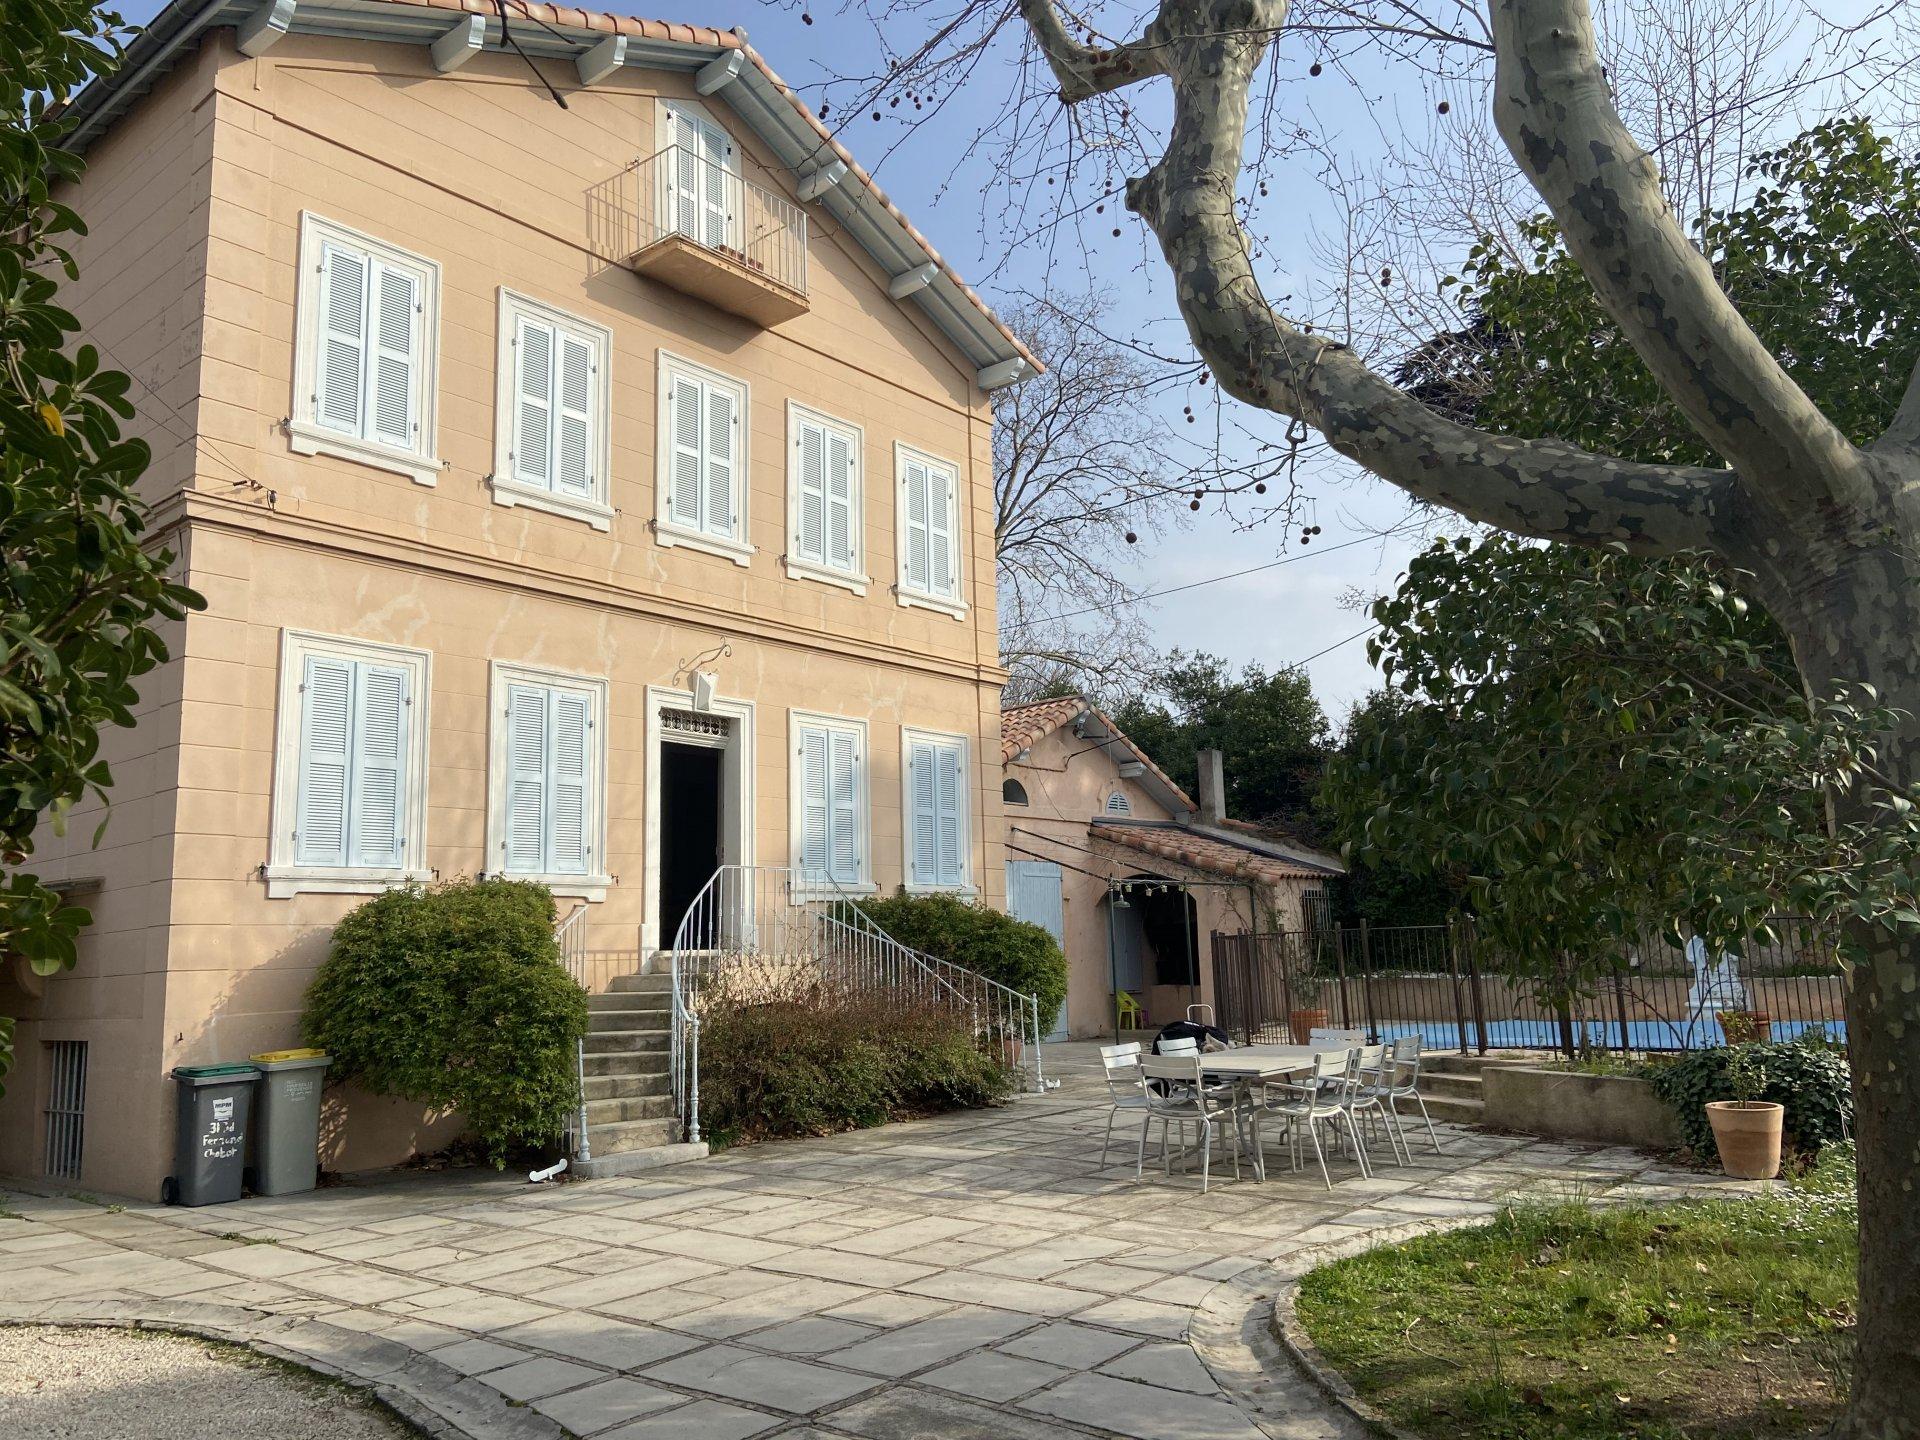 Maison piscine 13012 Marseille